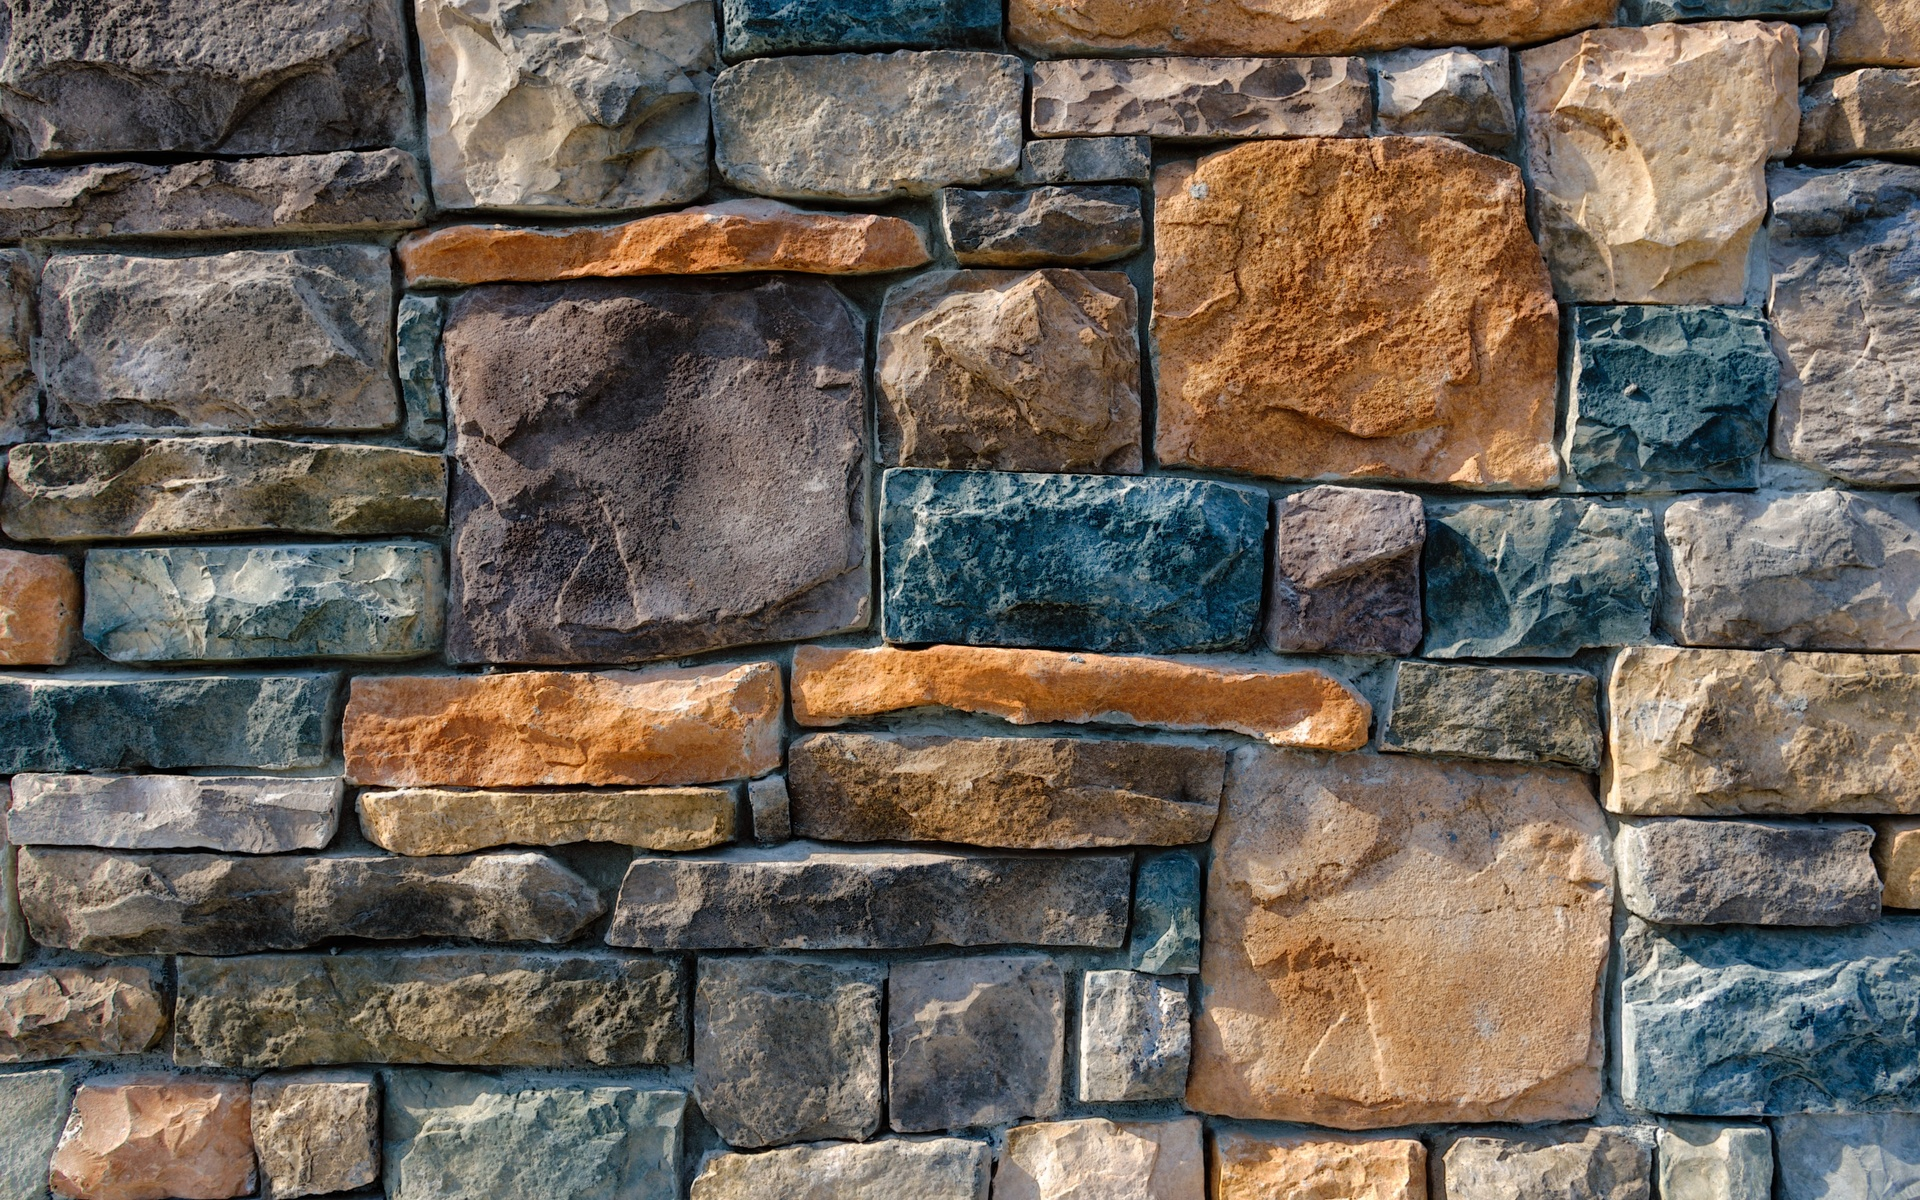 Brick wall pattern wallpaper 1920x1200 67484 WallpaperUP